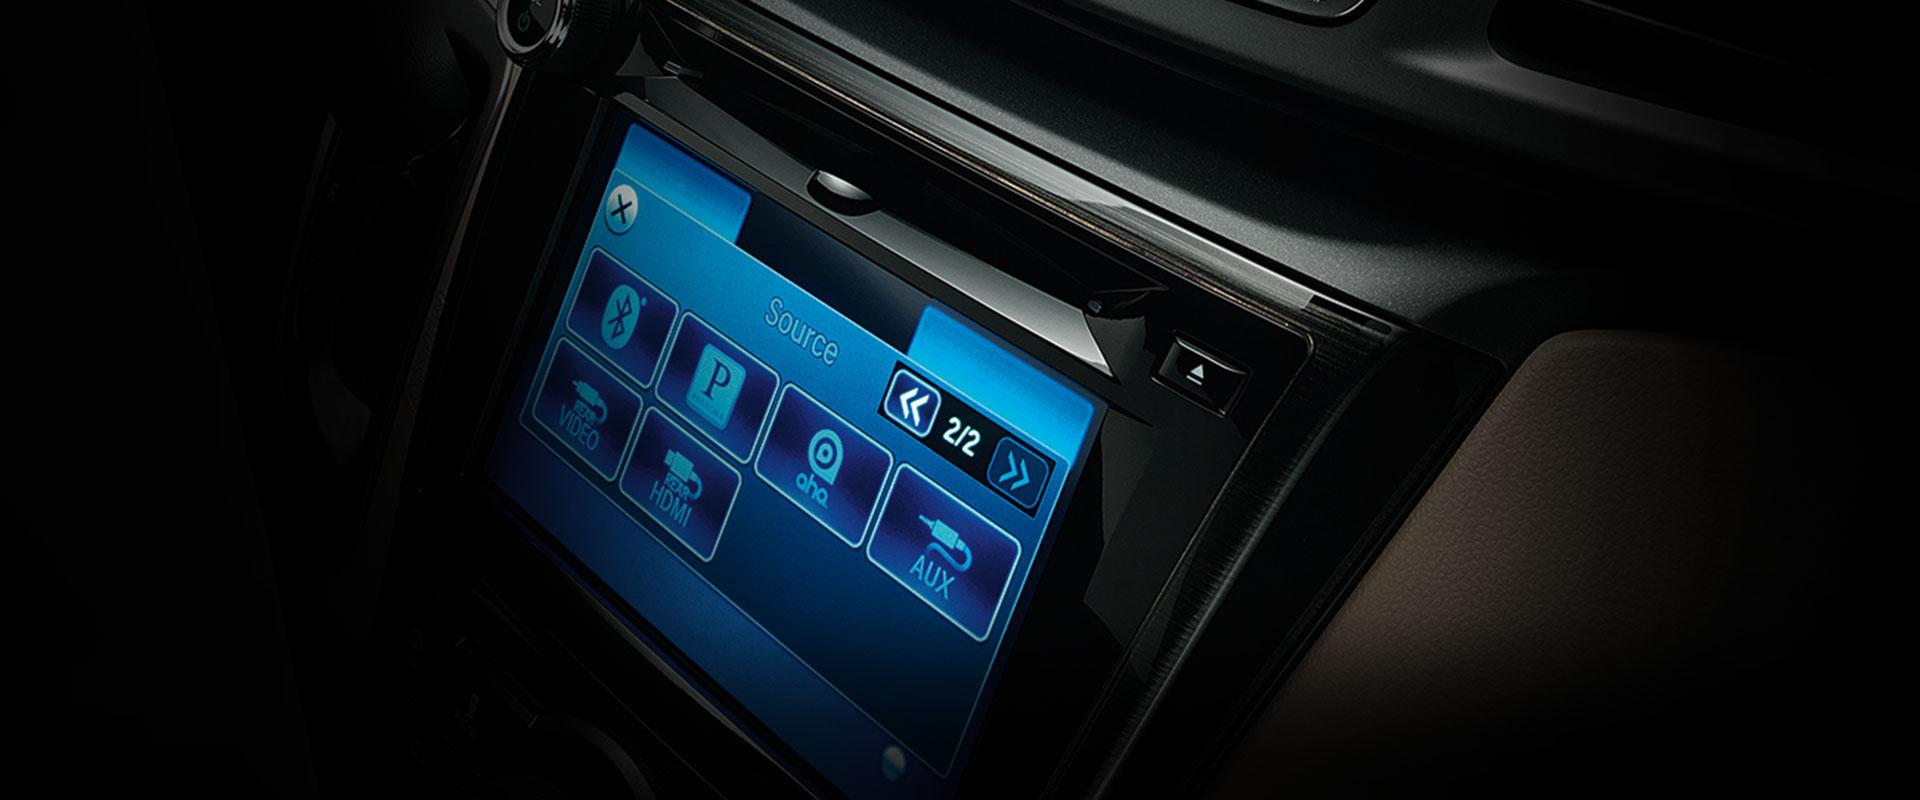 2017 Honda Odyssey Audio Touch-Screen